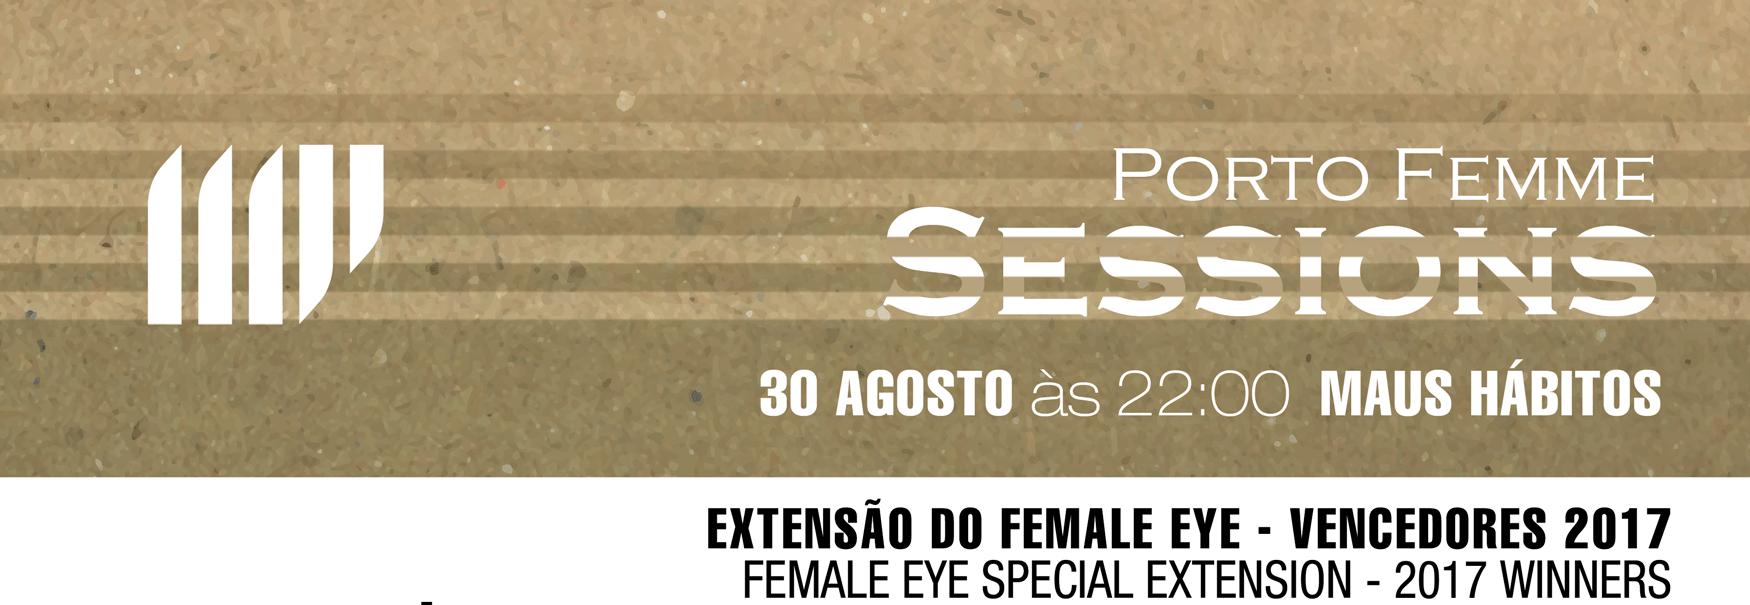 PORTO FEMME SESSIONS #3